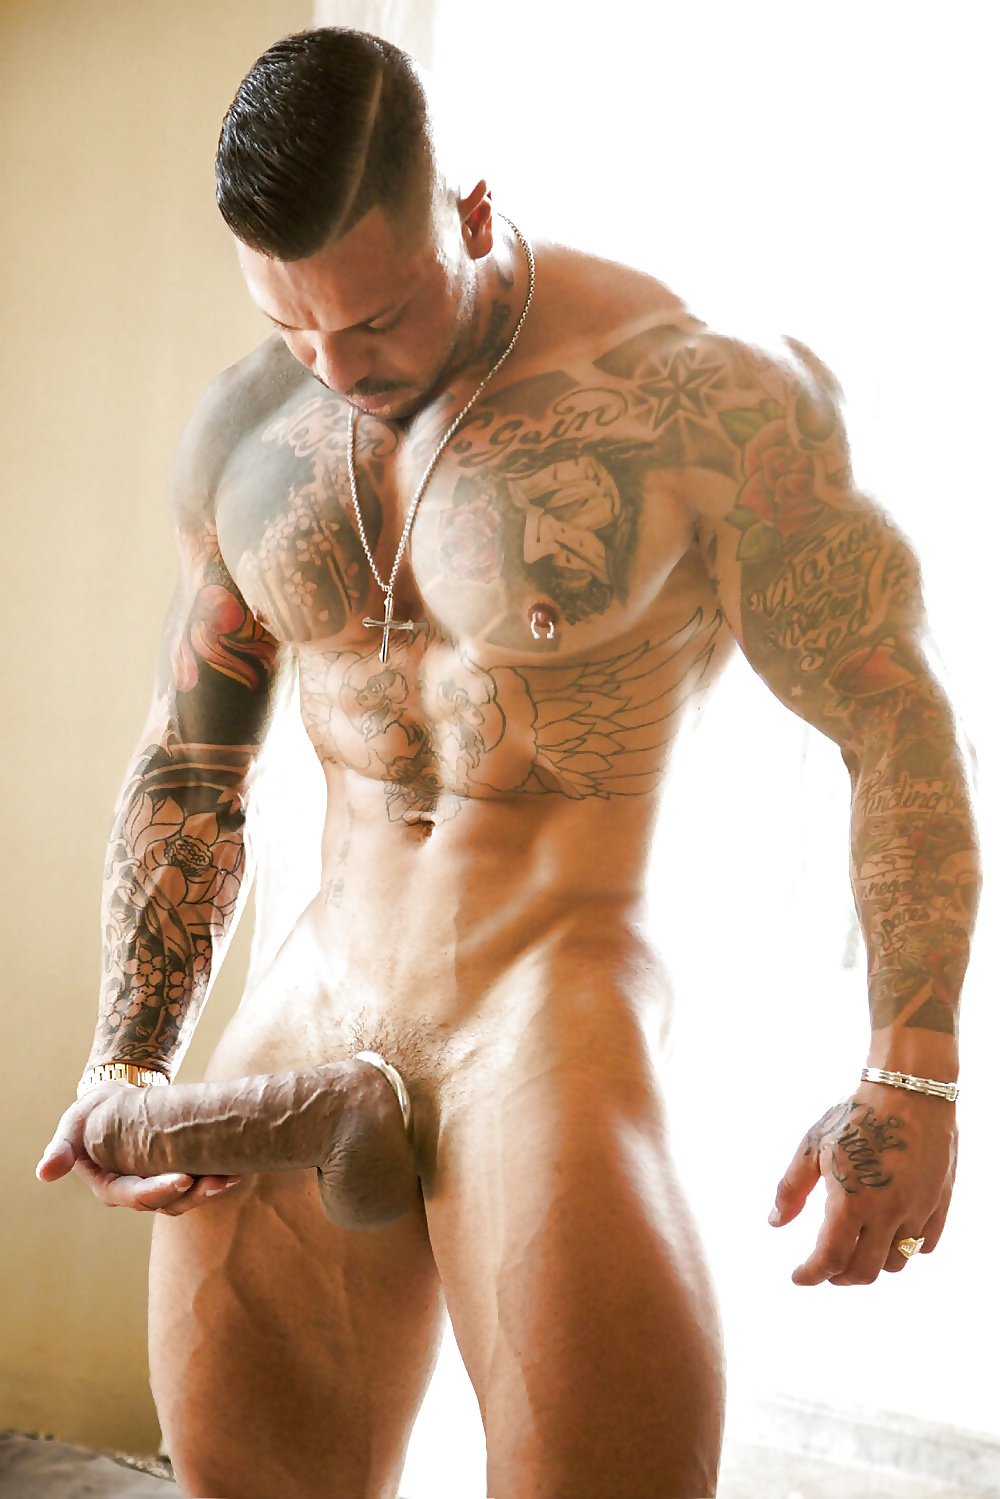 Get sexy gay muscle boys big boy underwear porno for free